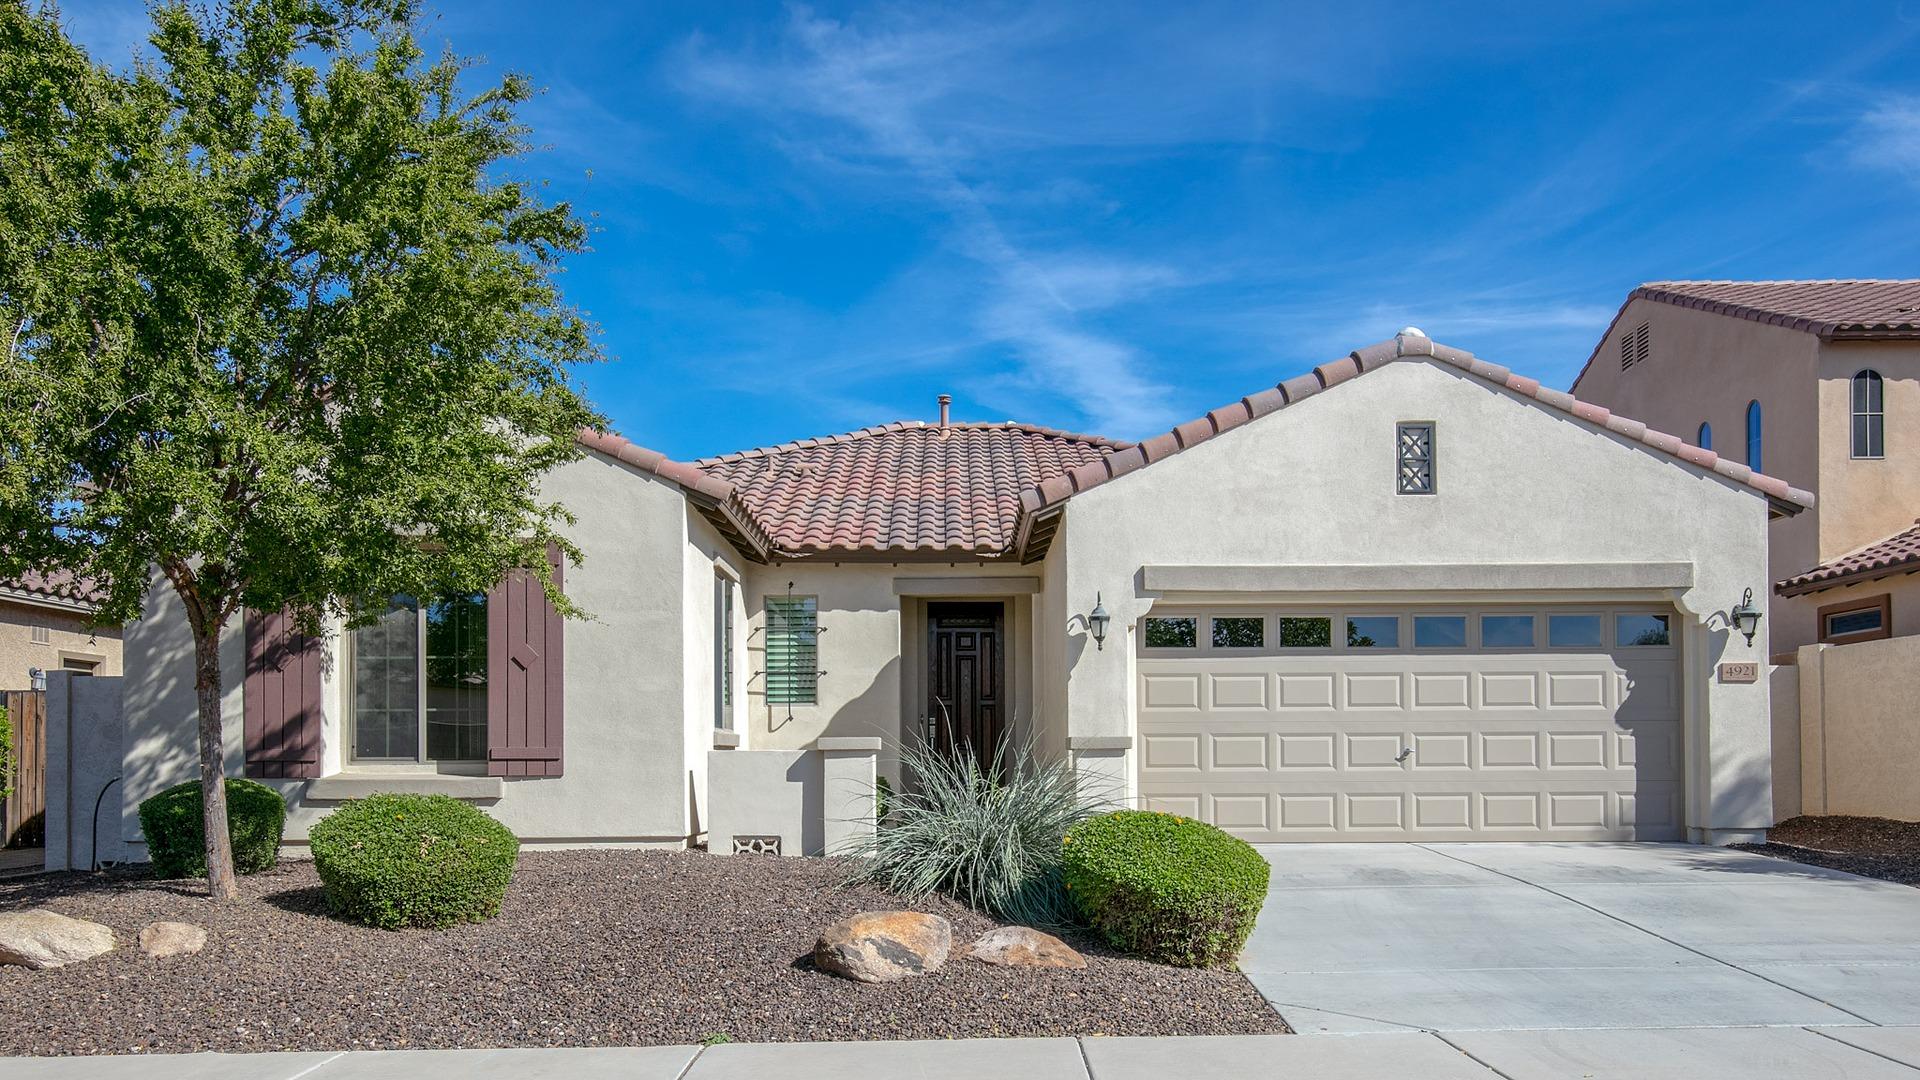 4921 S White Pl, Chandler, AZ 85249 - Old Stone Ranch | Amy Jones Group